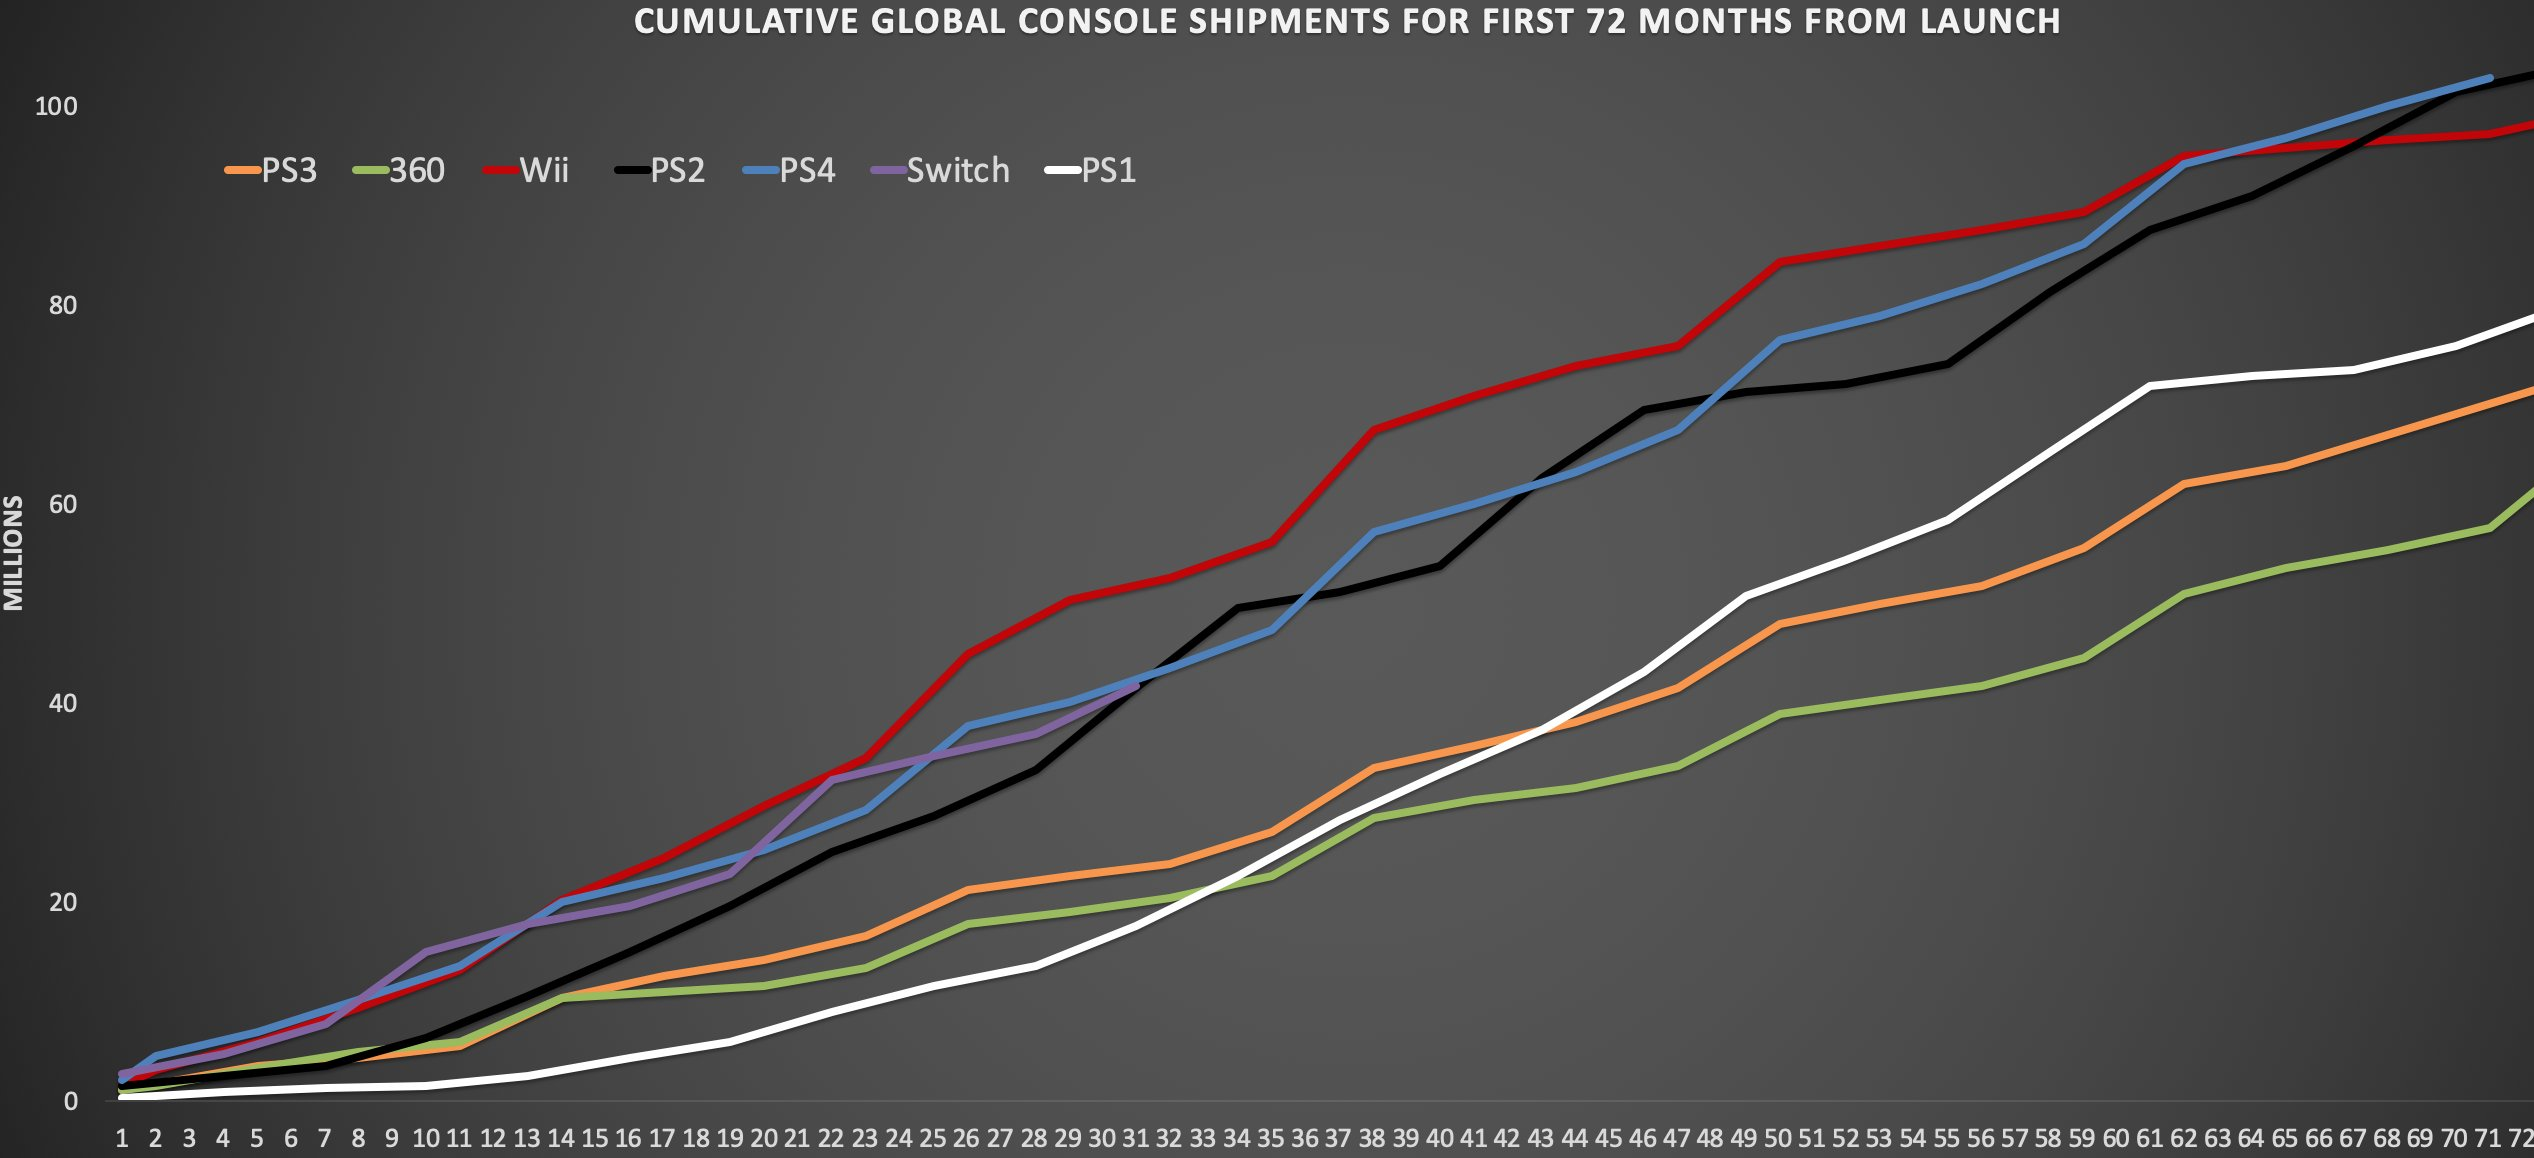 SMjaiX1 - Switch好調4000万台突破!史上最速で一億台を突破したPS4に近いペース